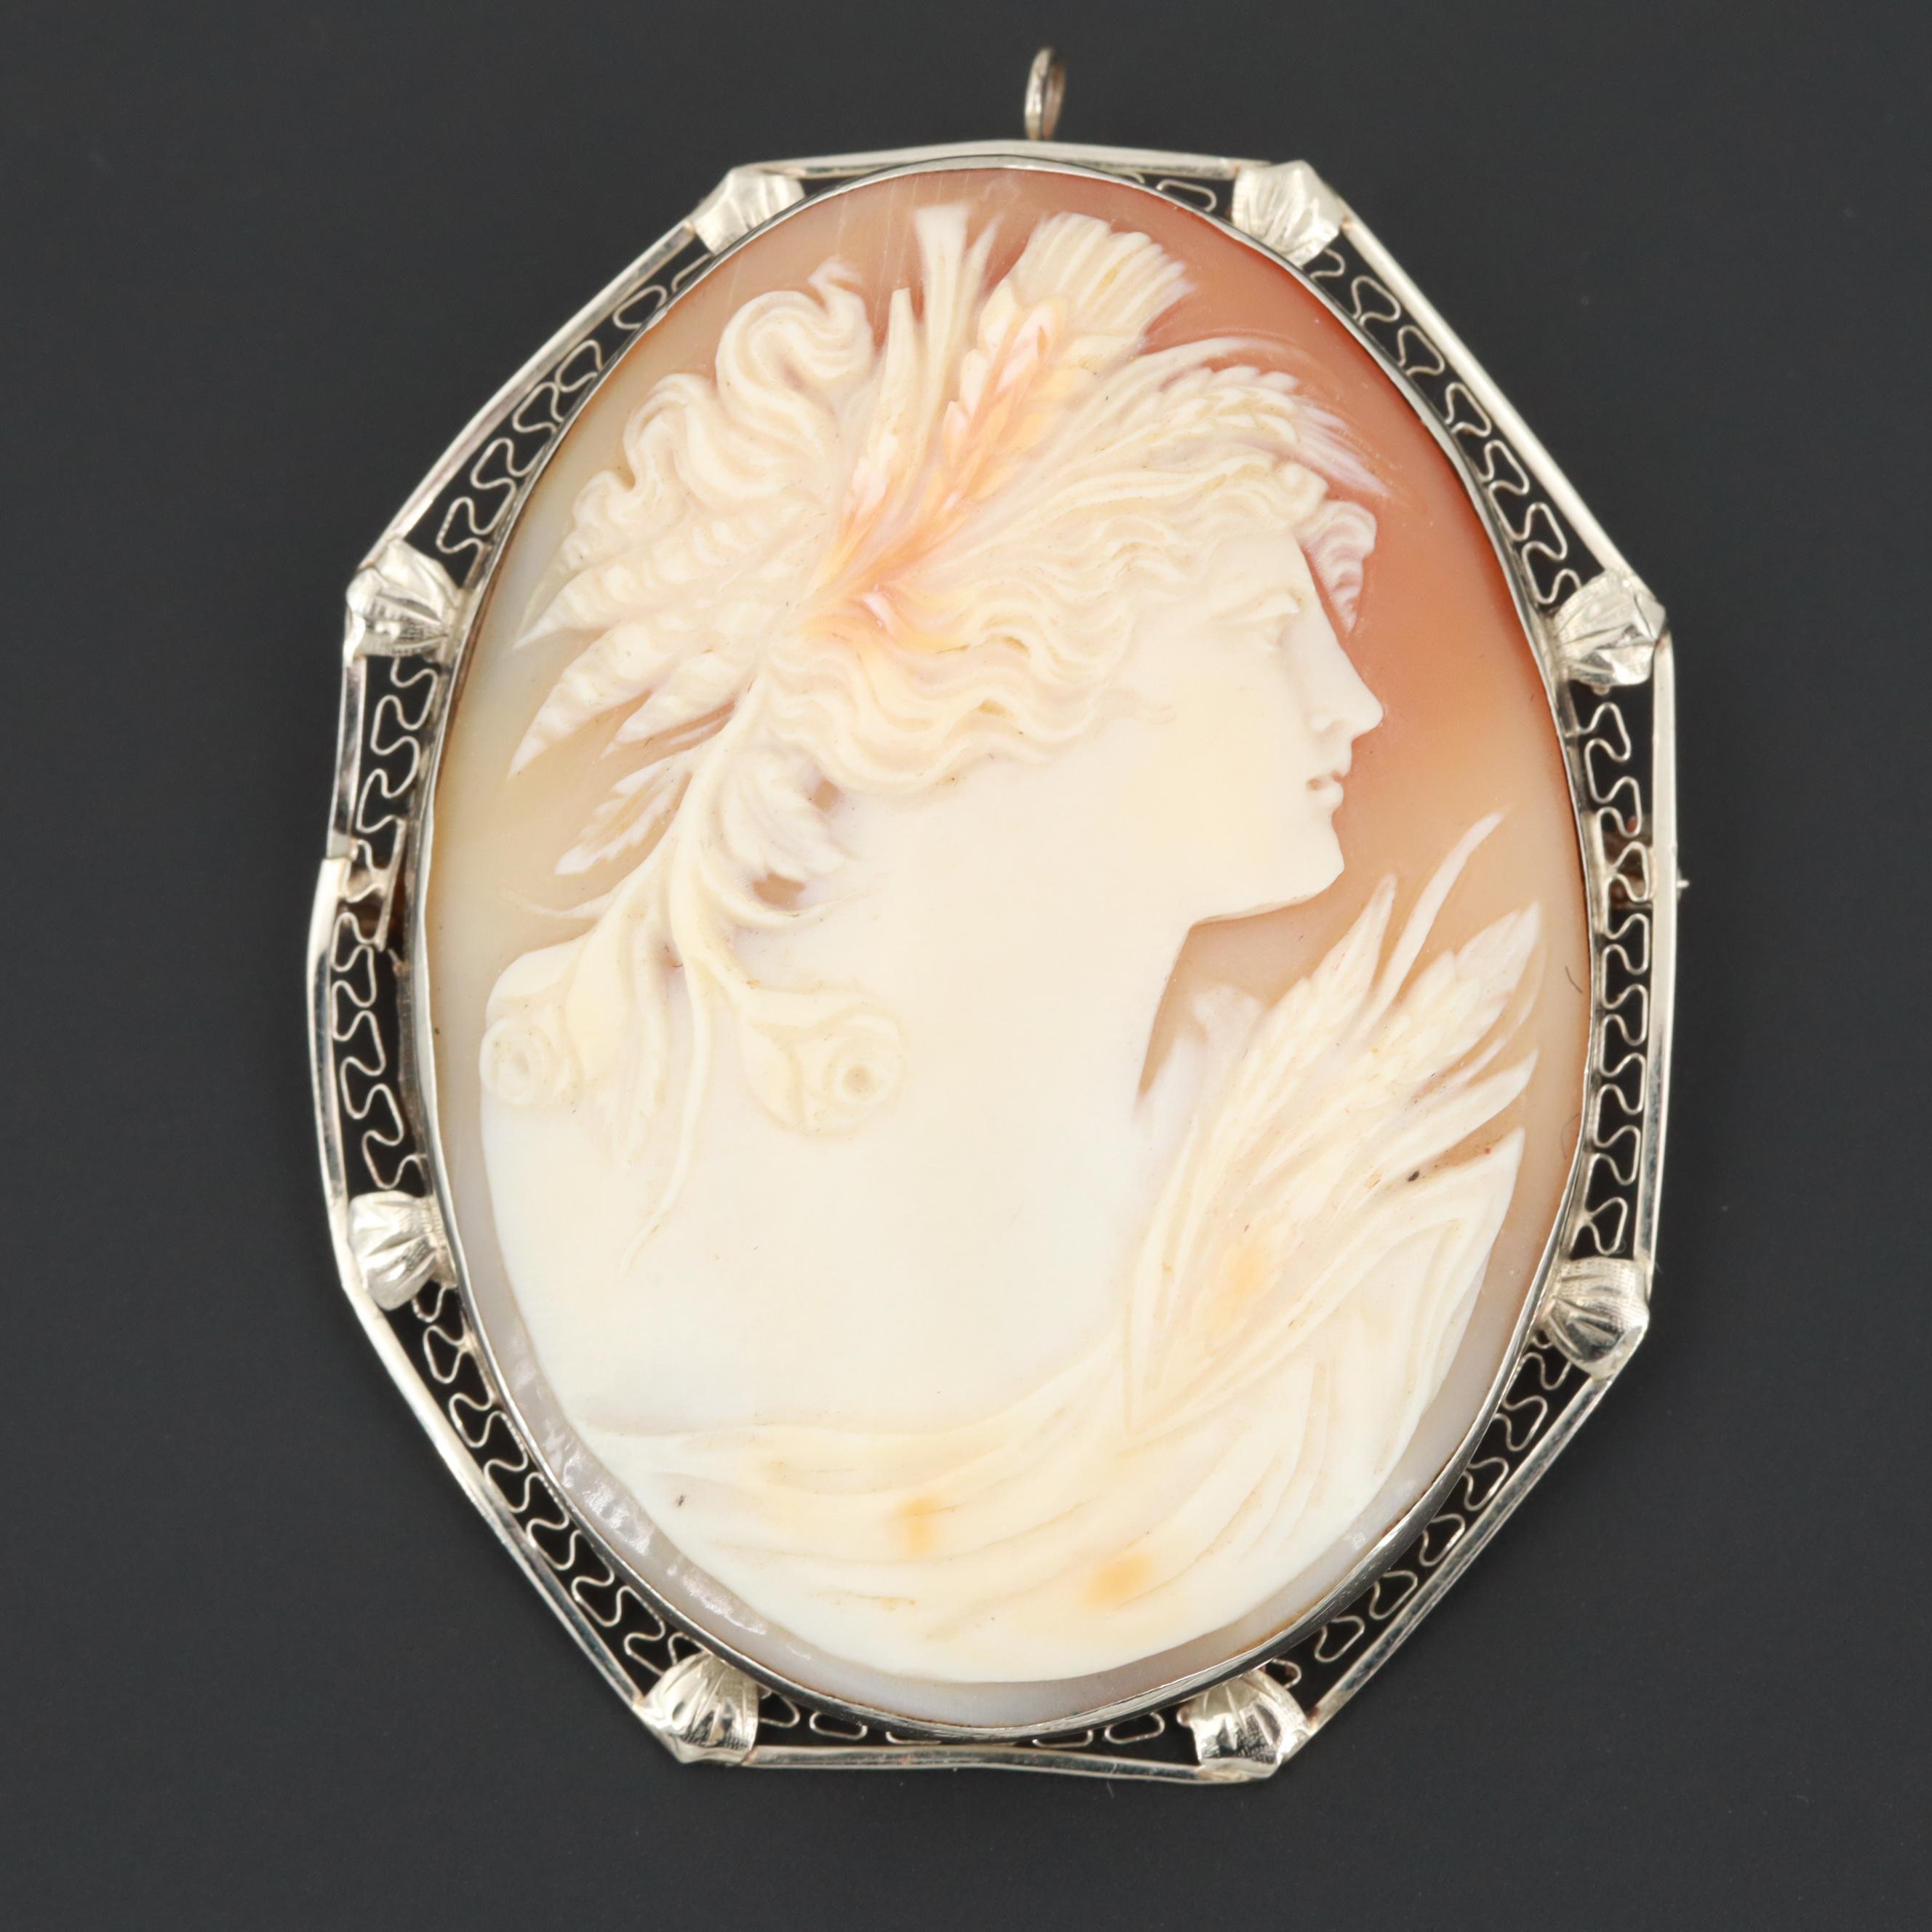 Circa 1930s 14K White Gold Helmet Shell Cameo Converter Brooch